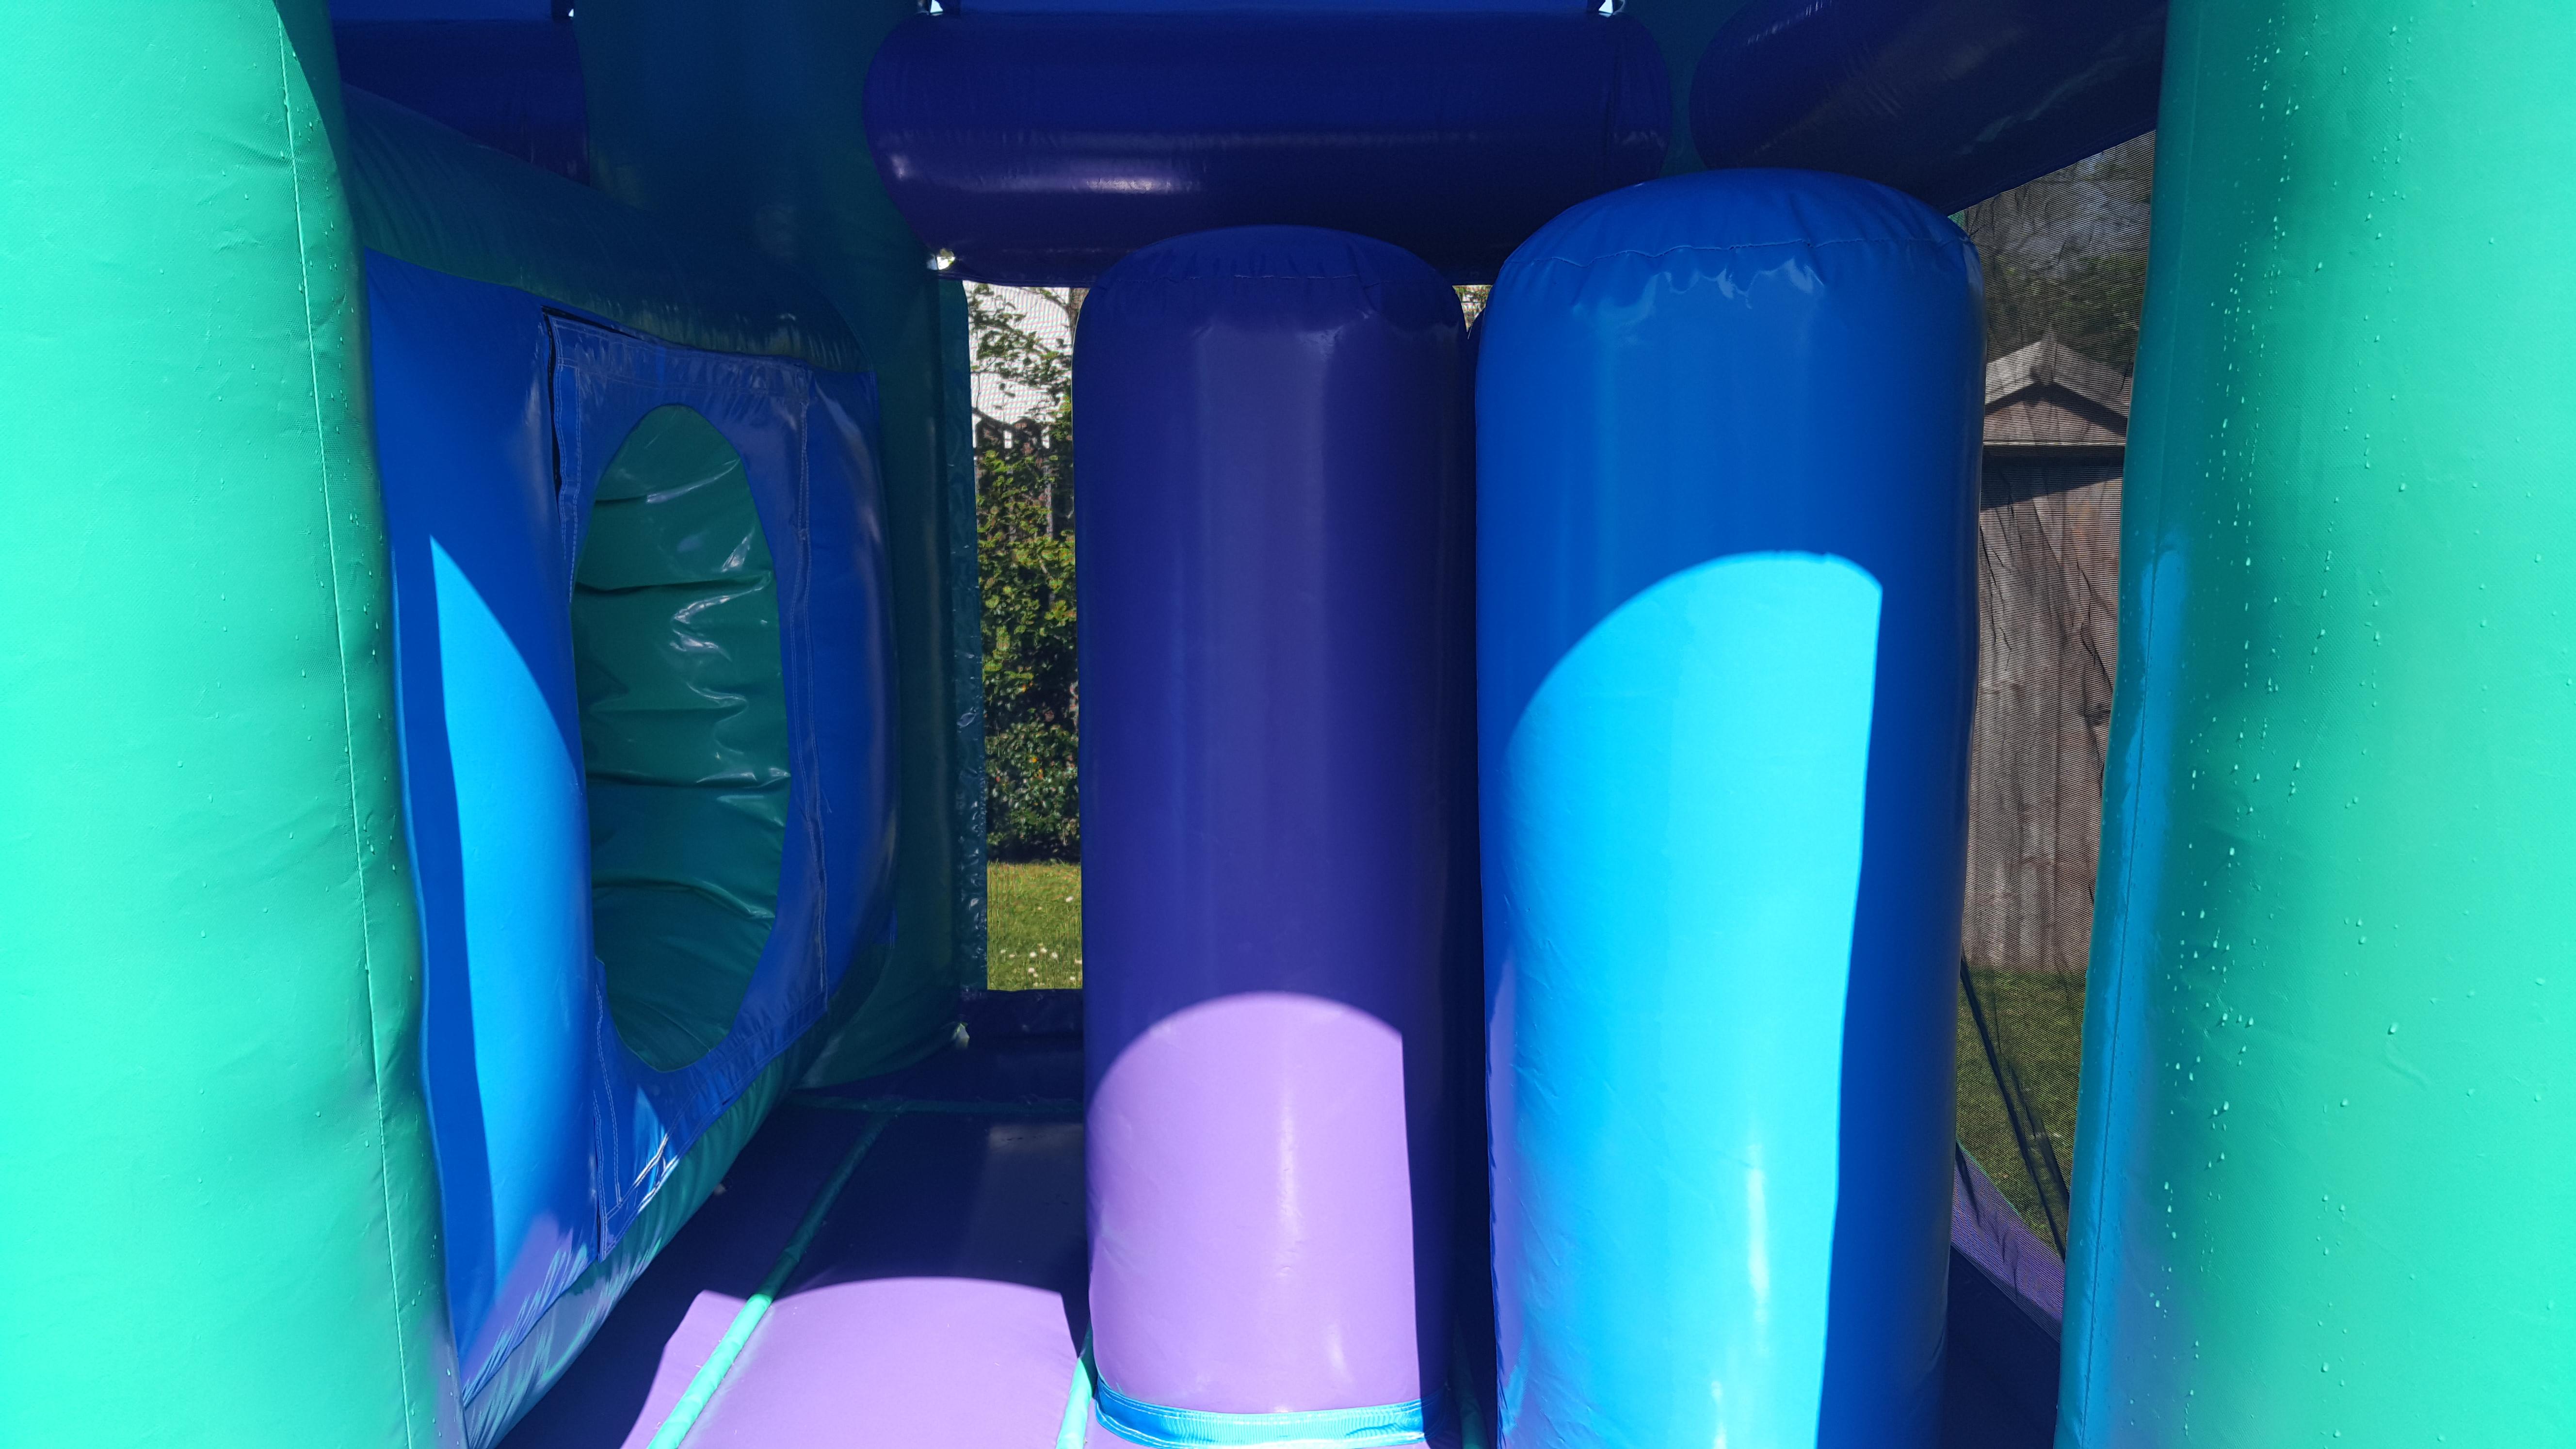 27 Foot Course Sligo Bouncy Castles